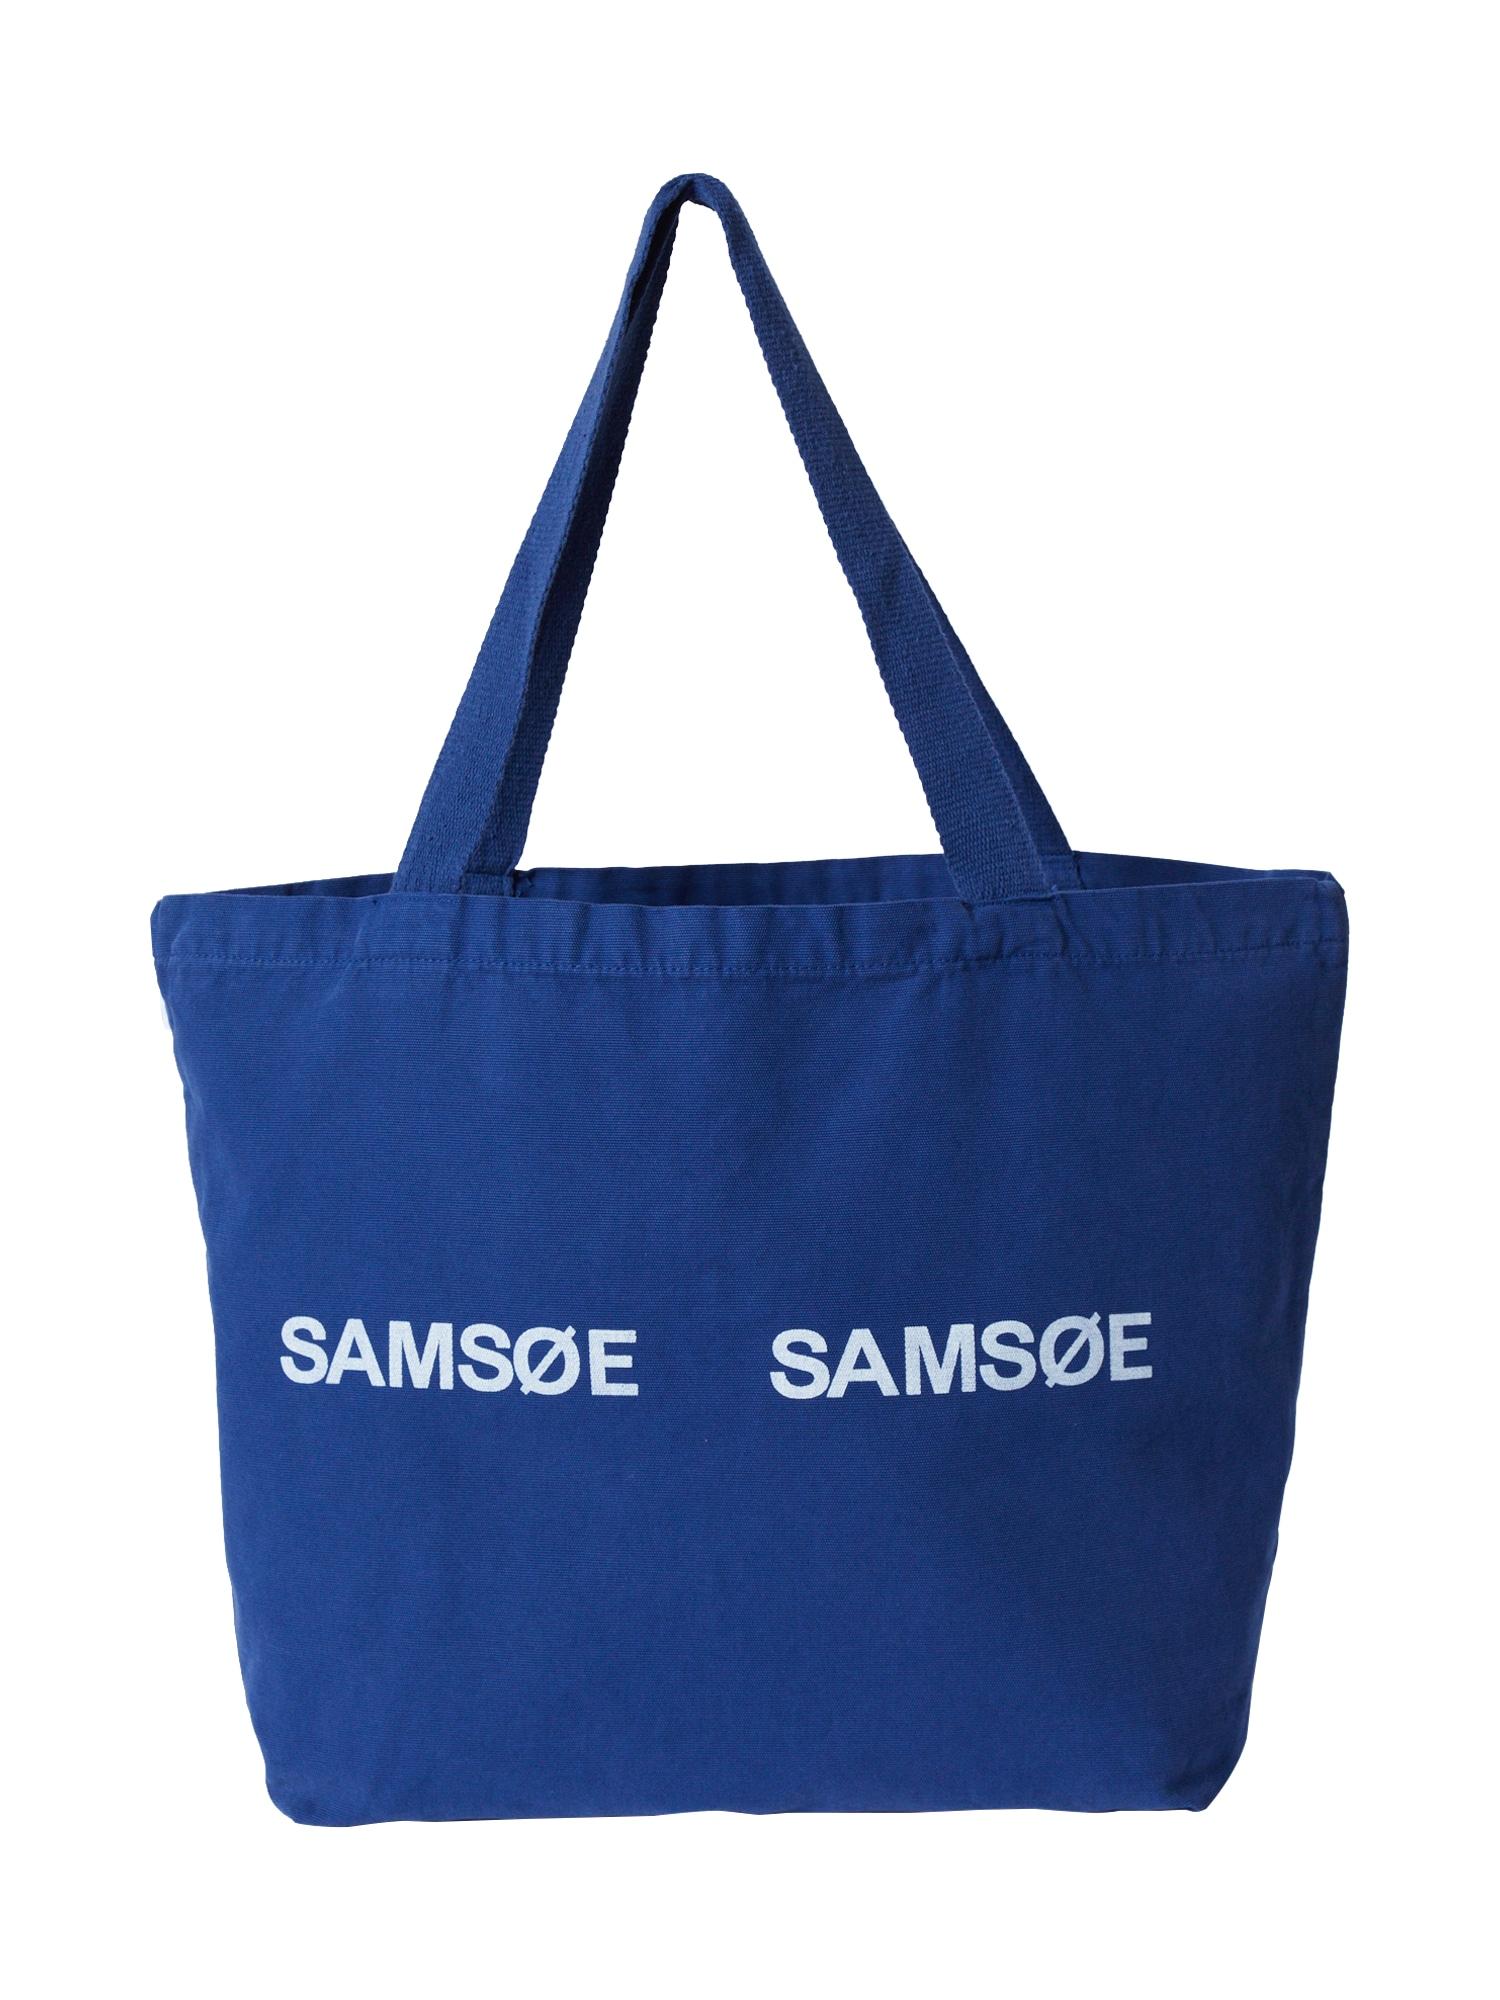 Samsoe Samsoe Pirkinių krepšys 'Frinka' mėlyna